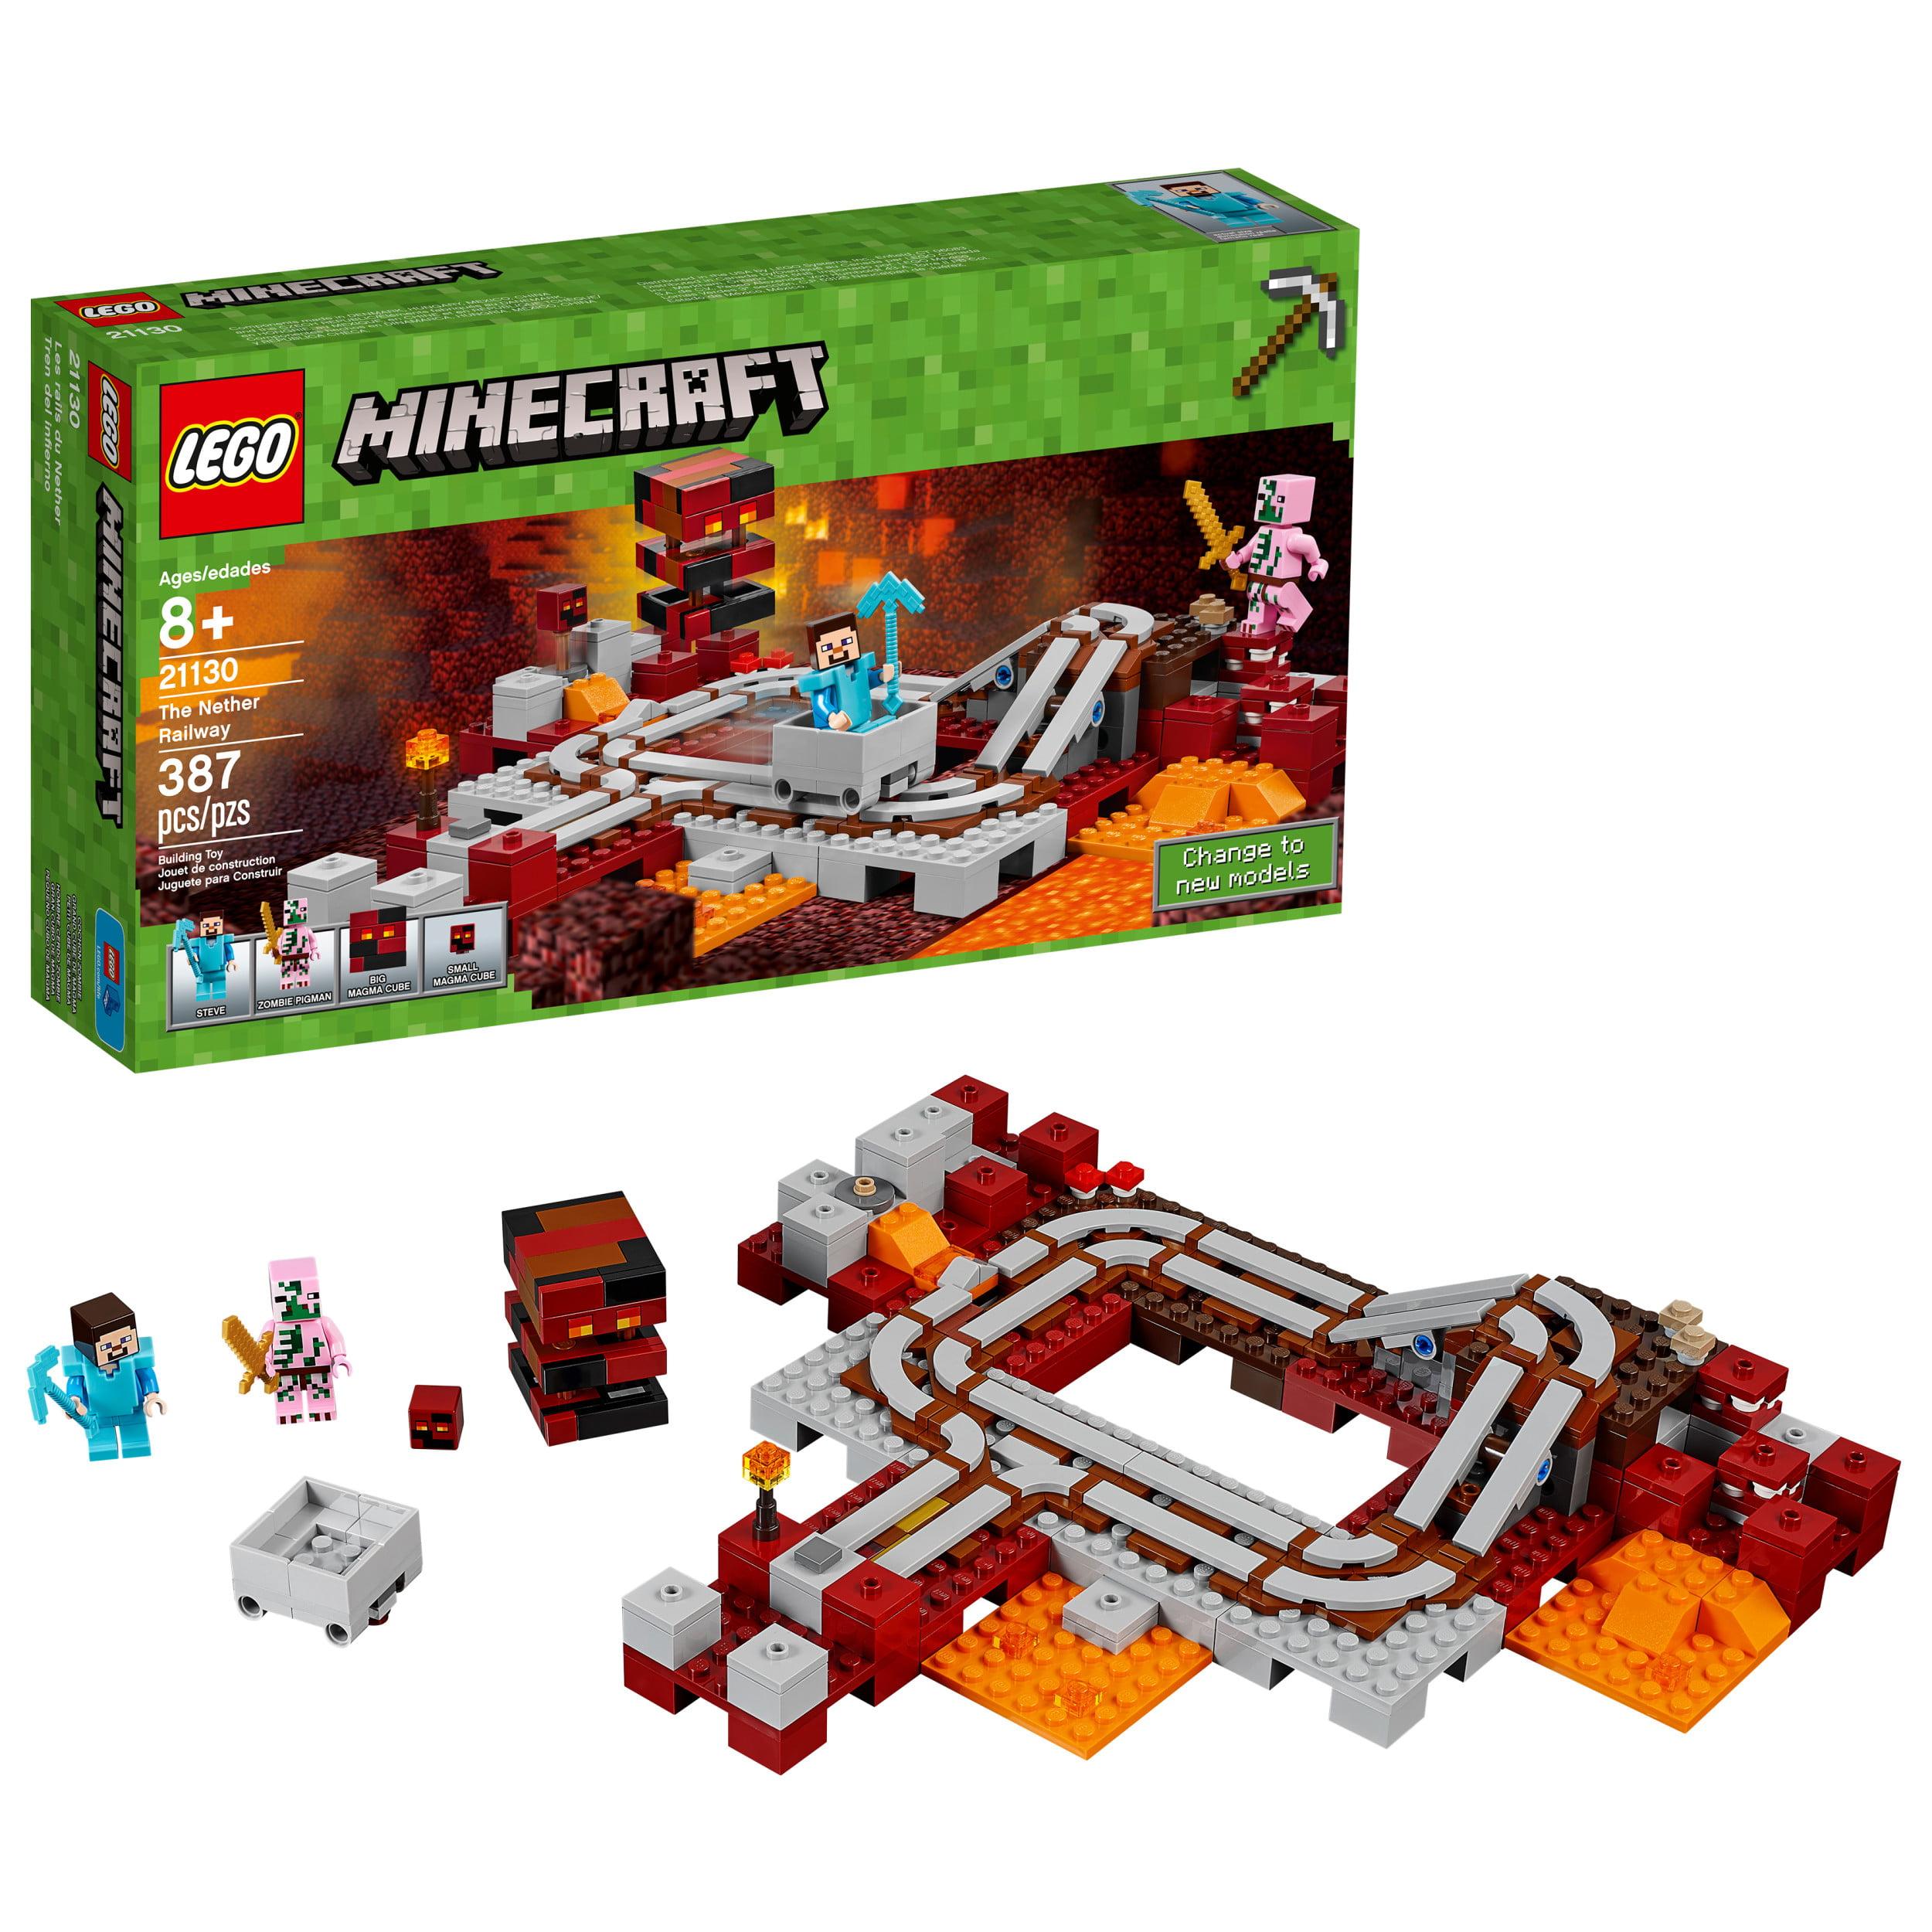 Lego Minecraft The Nether Railway 21130 by LEGO System Inc